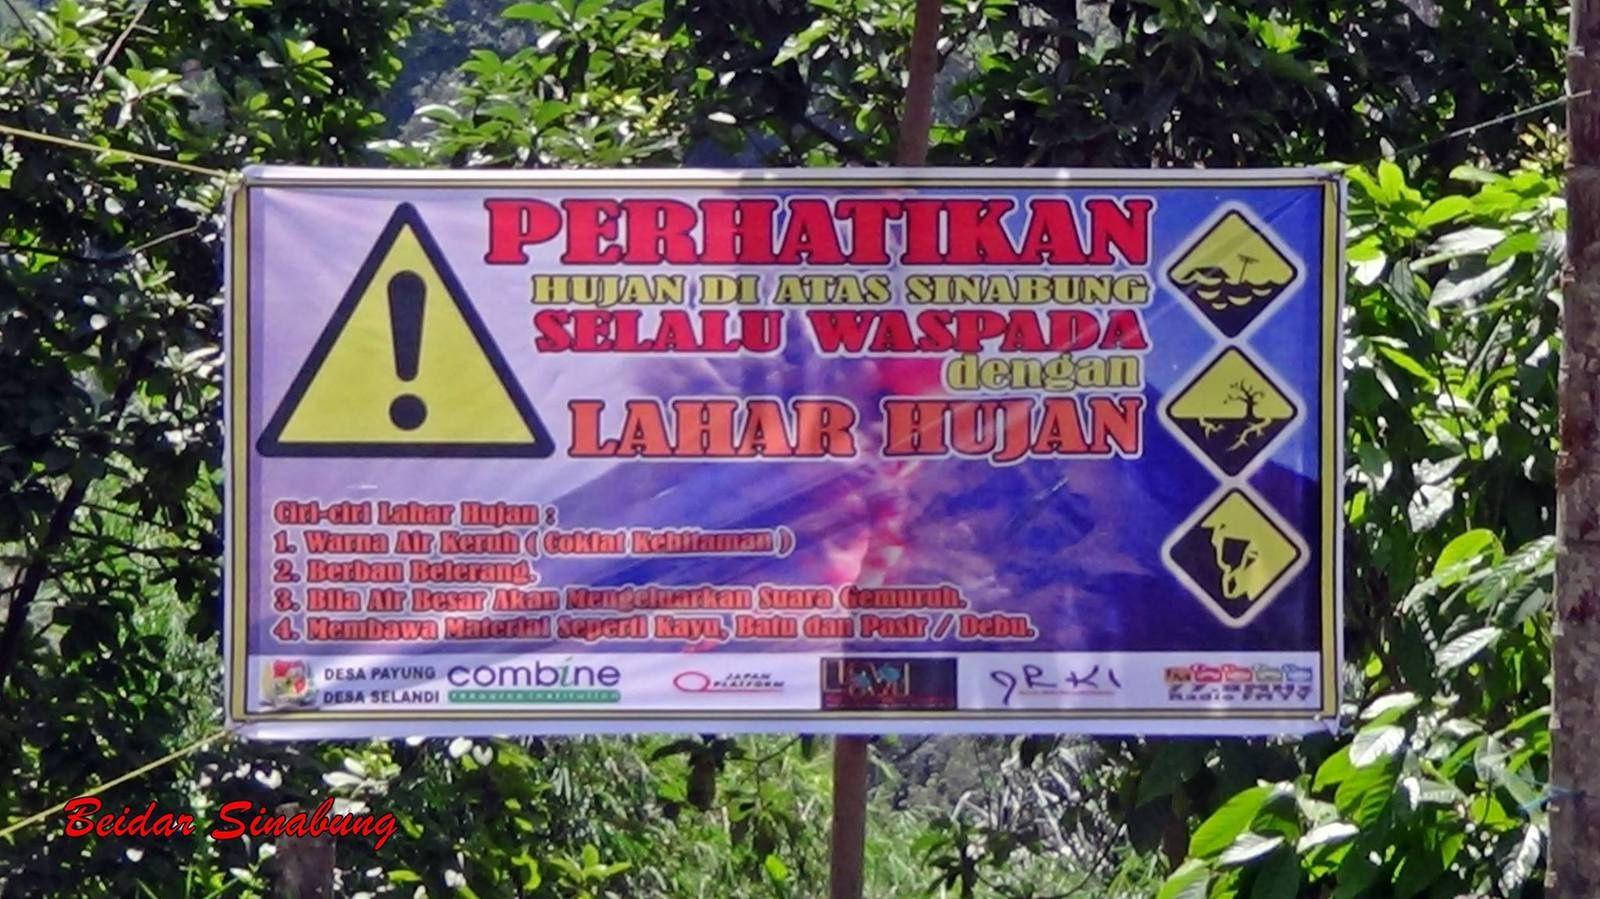 Risques de lahars au sinabung - 09.05.2016 - photos Beidar Sinabung /  Sandri Sukatendel